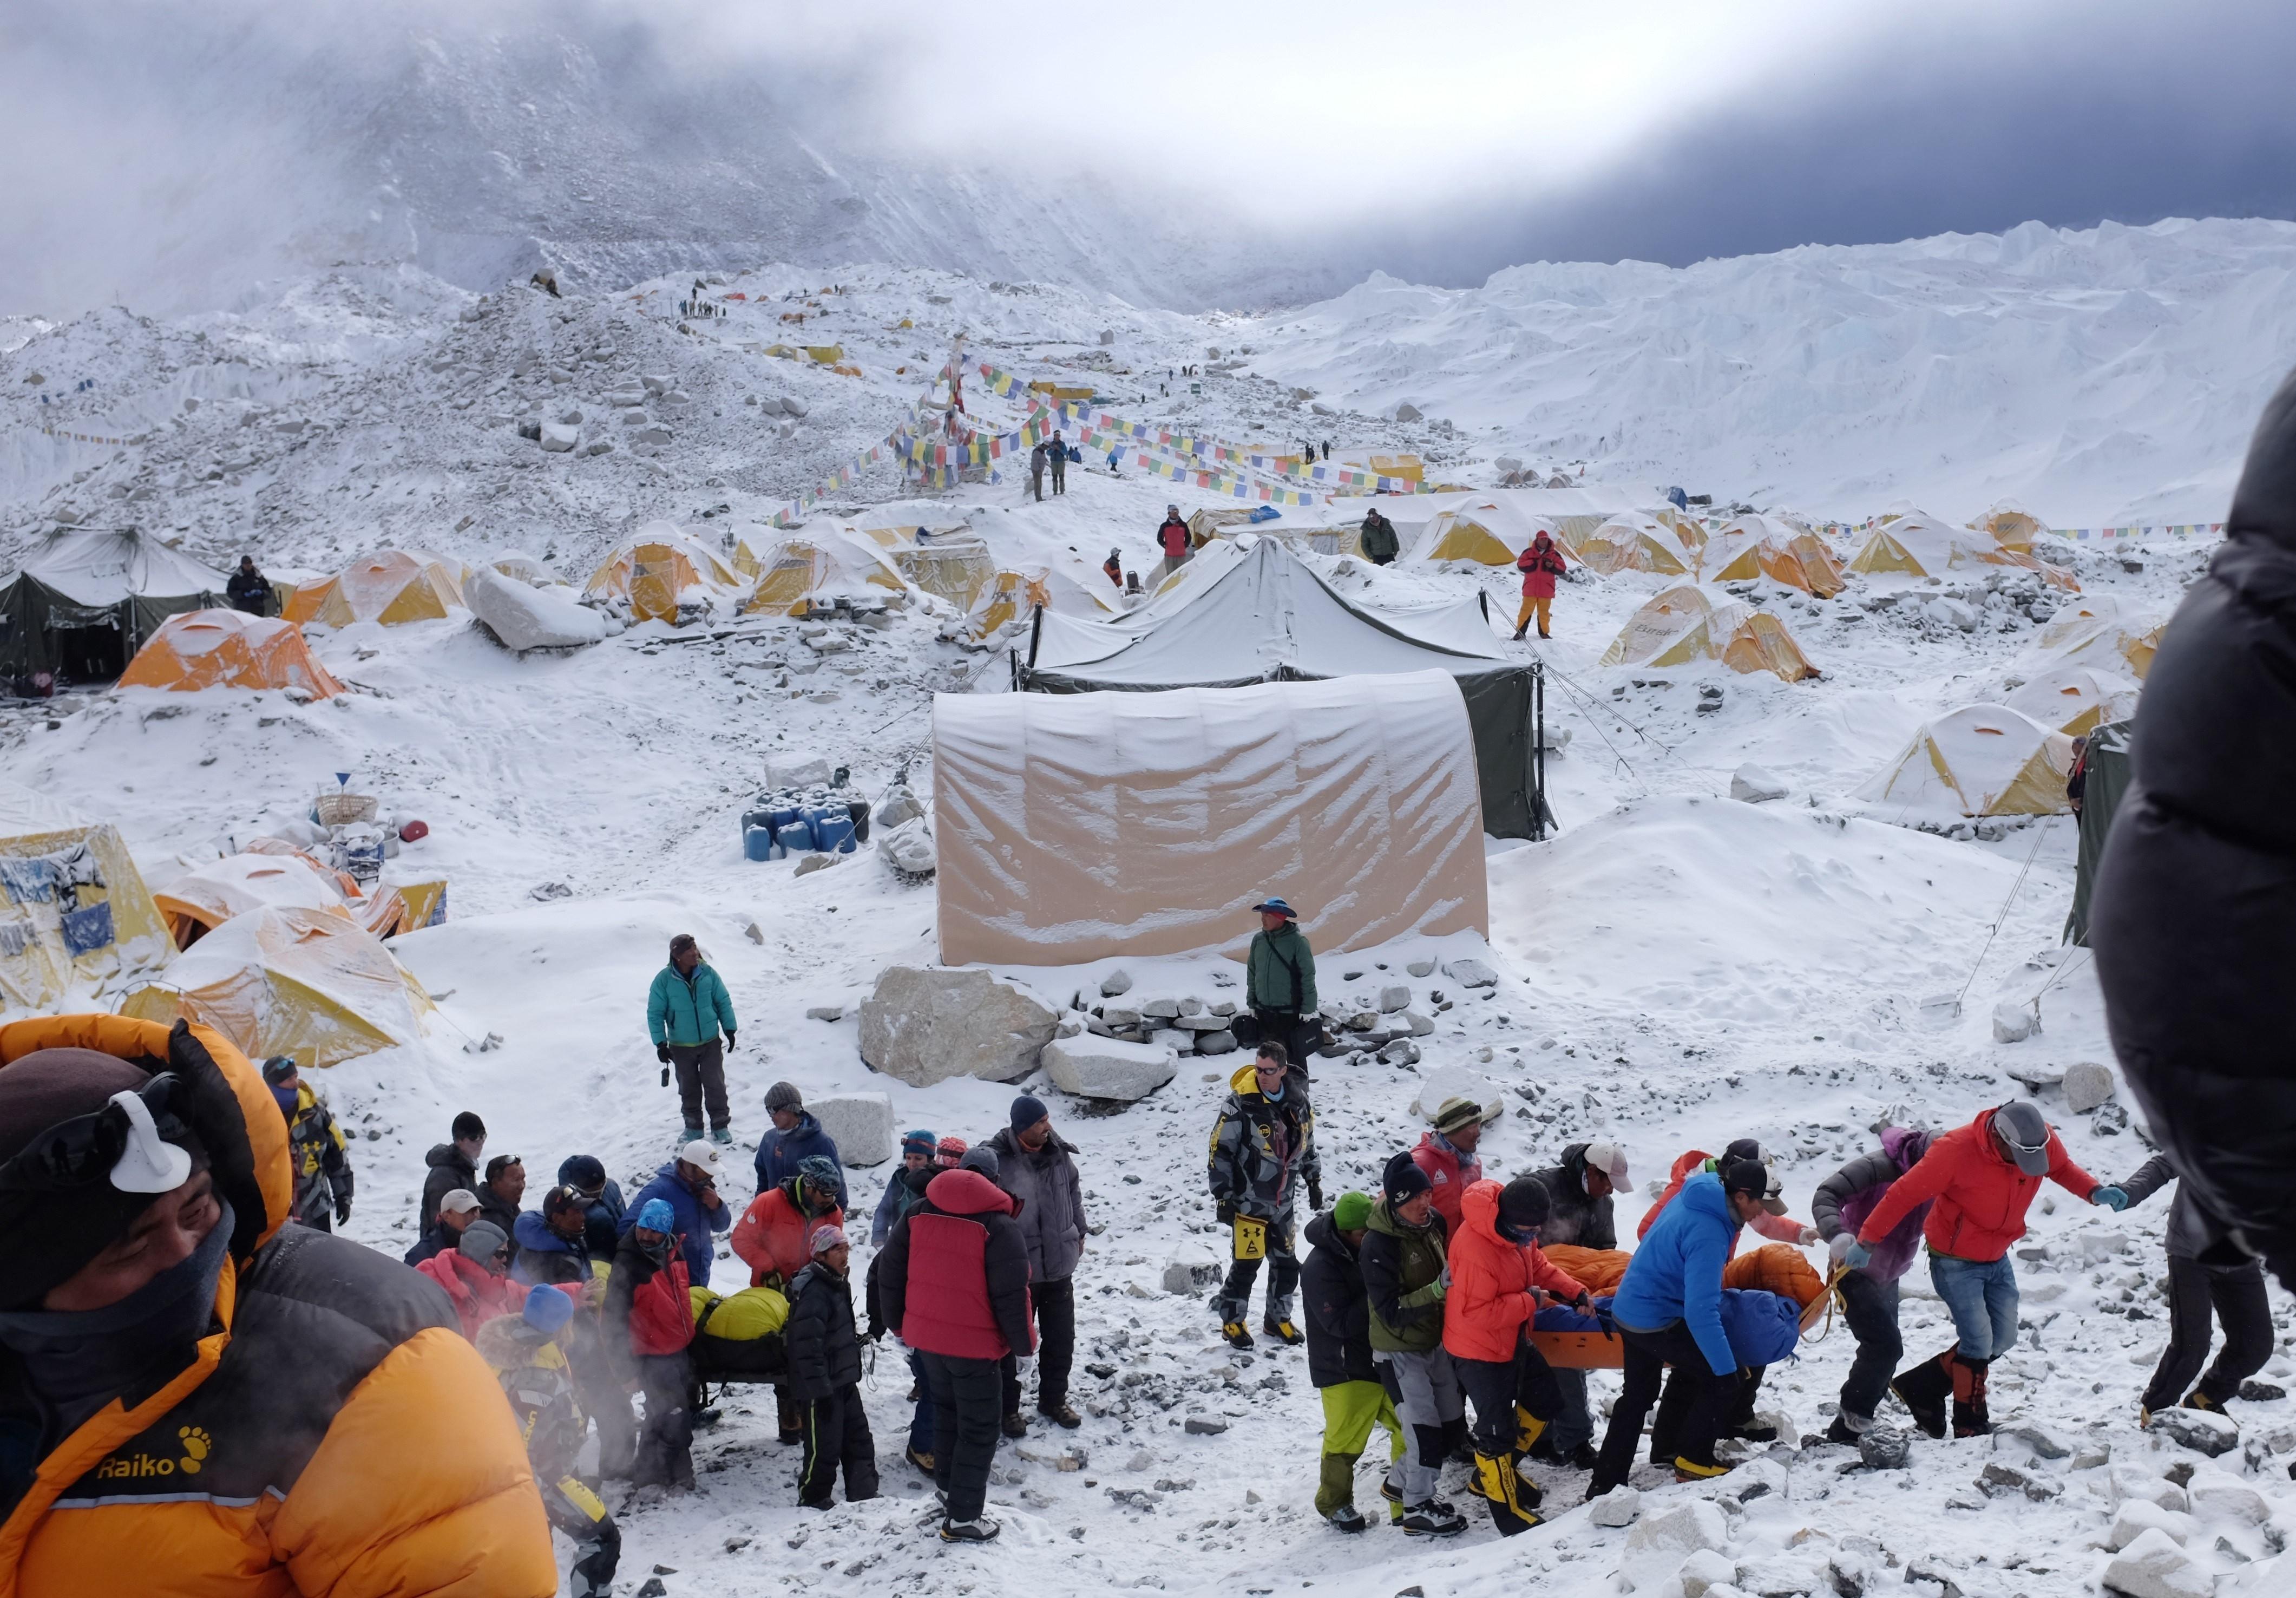 nepal 2015 avalanche